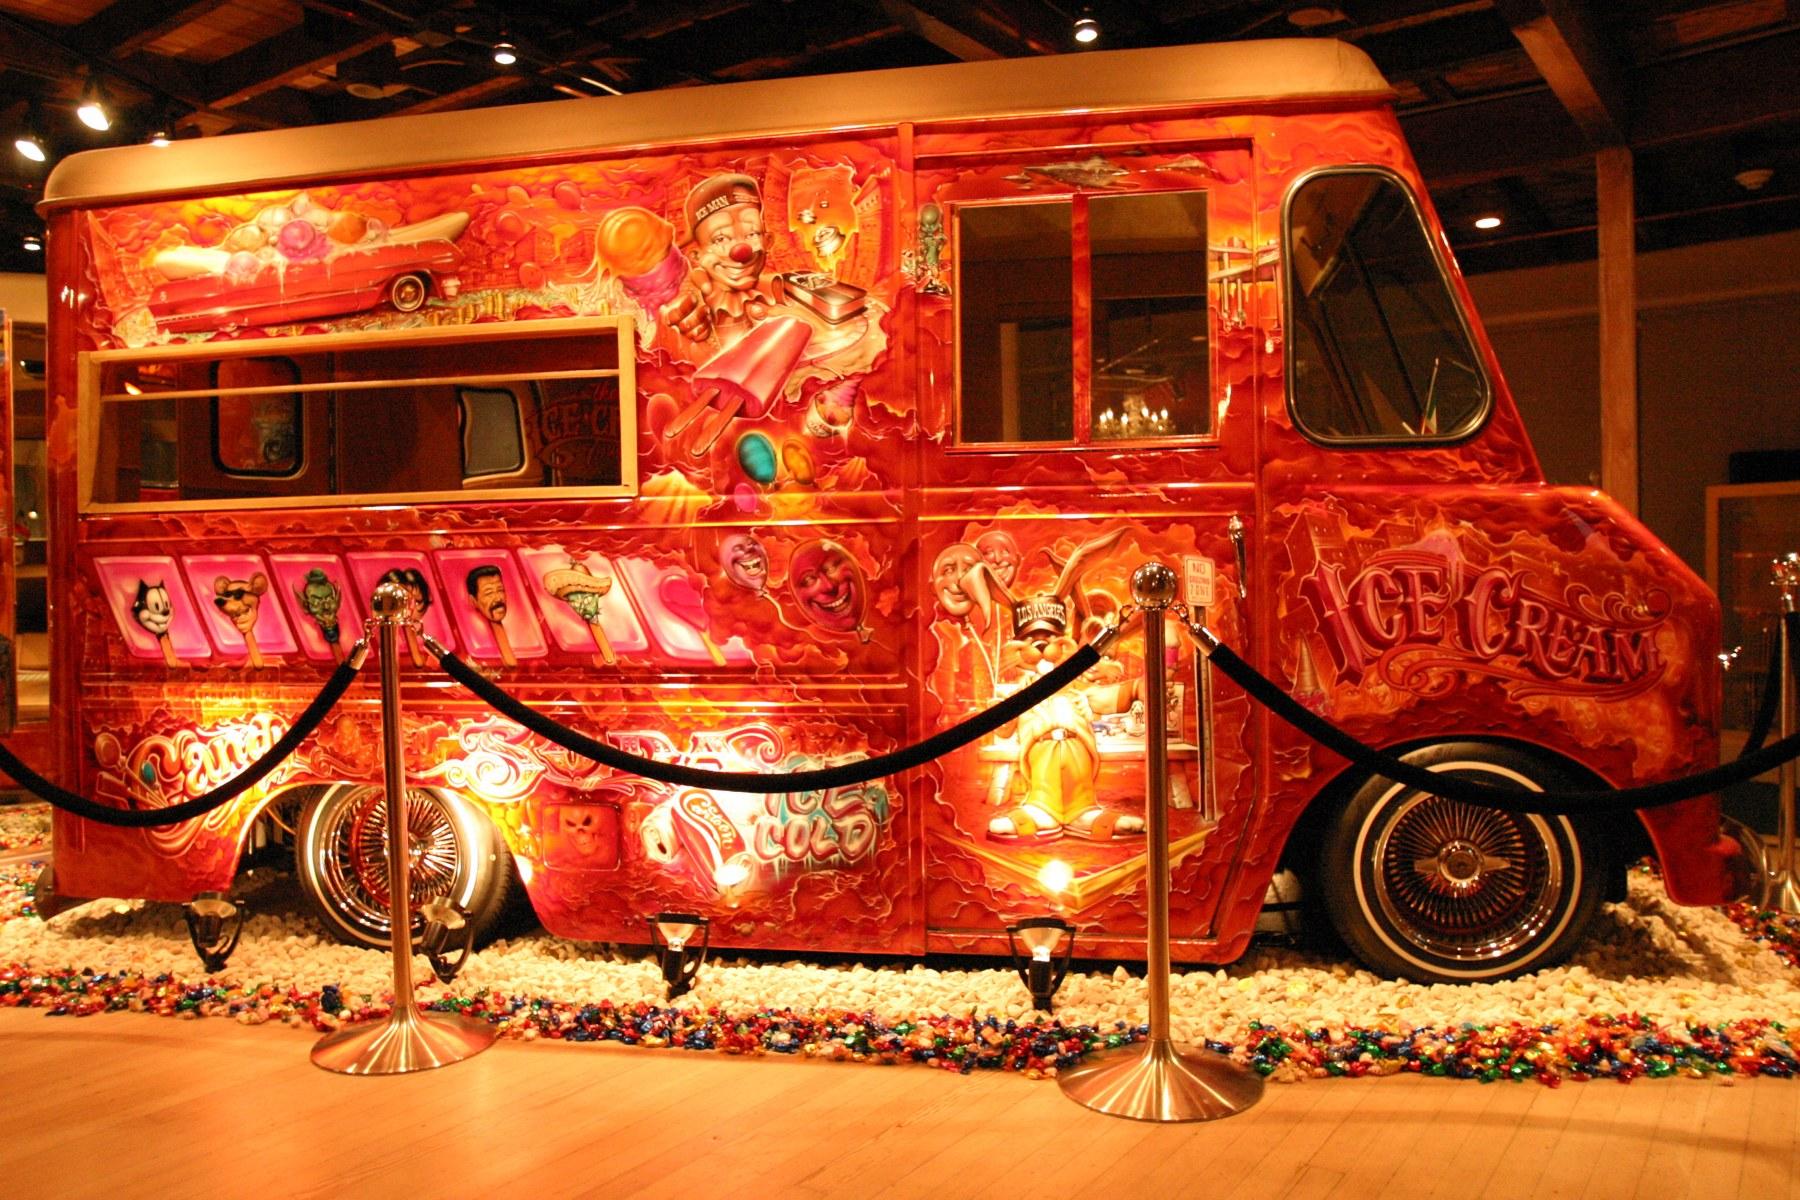 Mister Cartoon Ice Cream Truck, 2004, photo by Eriberto Oriol.